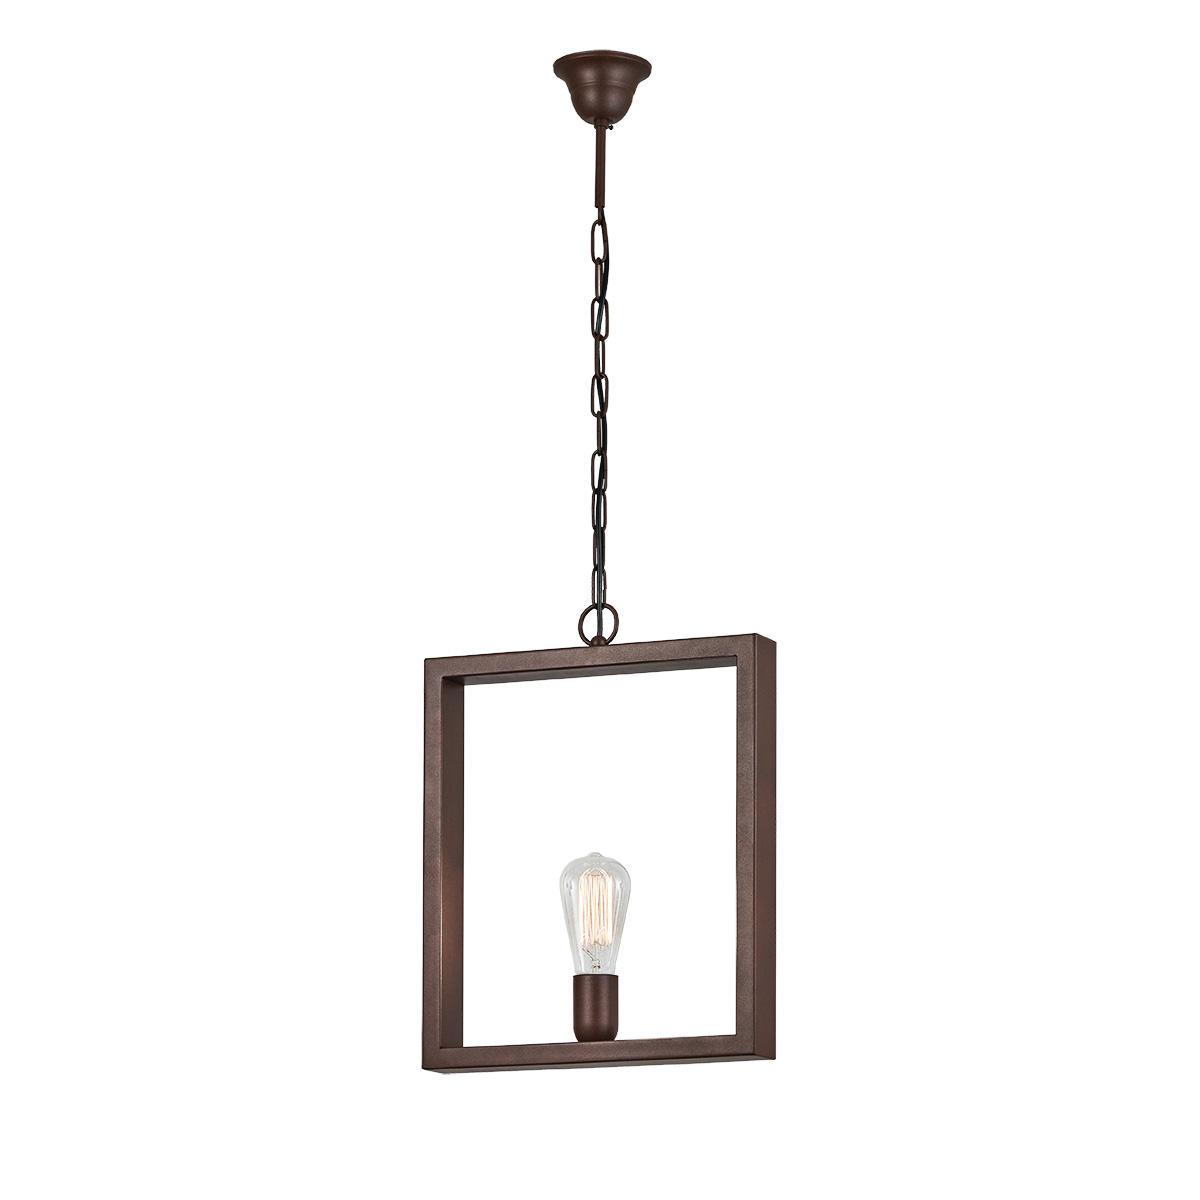 Vintage Industrial κρεμαστό φωτιστικό ΘΑΣΟΣ industrial suspension lamp